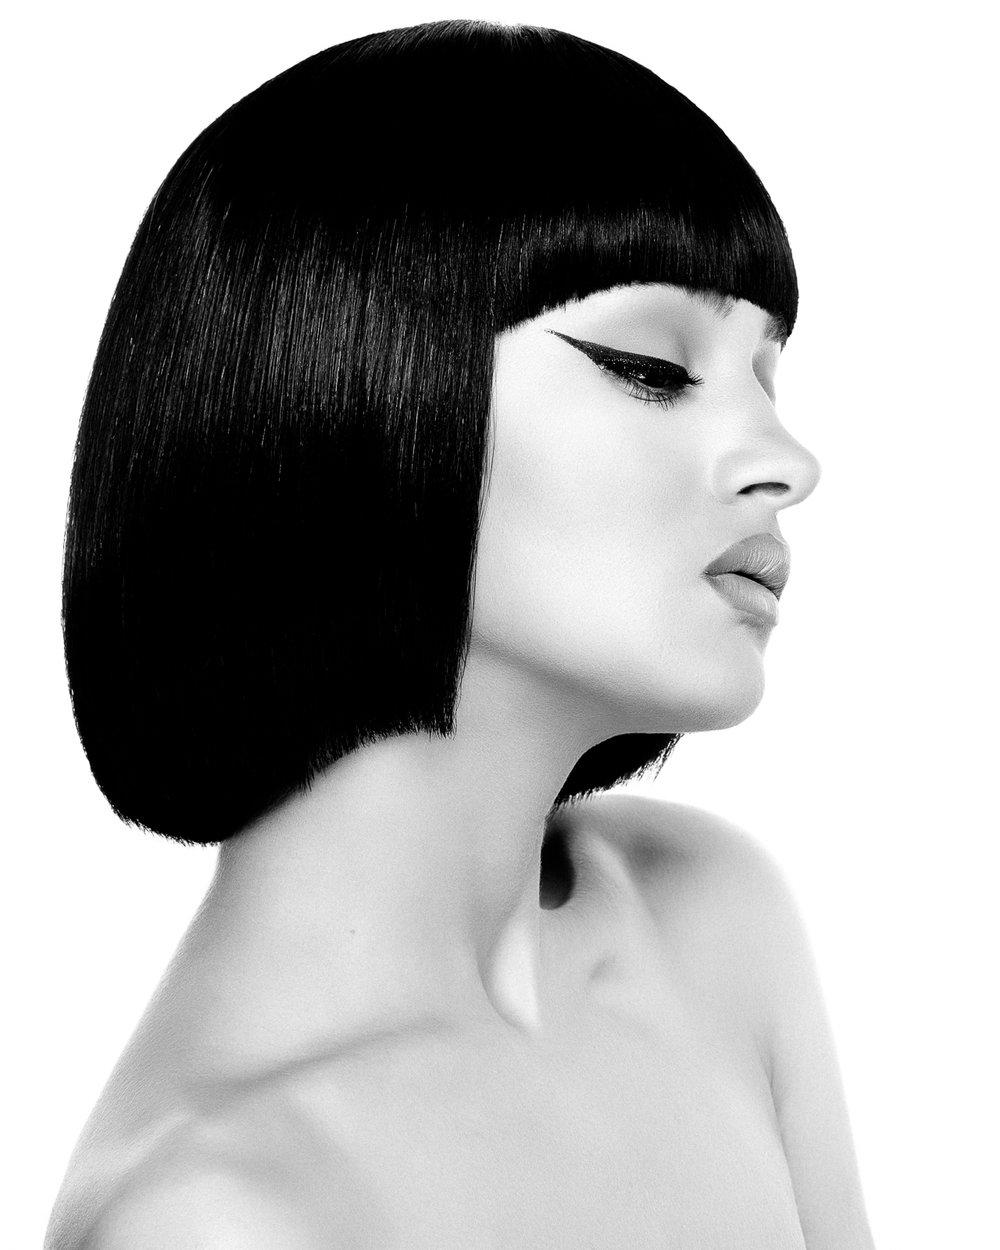 beija-angeliq-beauty-test-02-090-hires-web.jpg